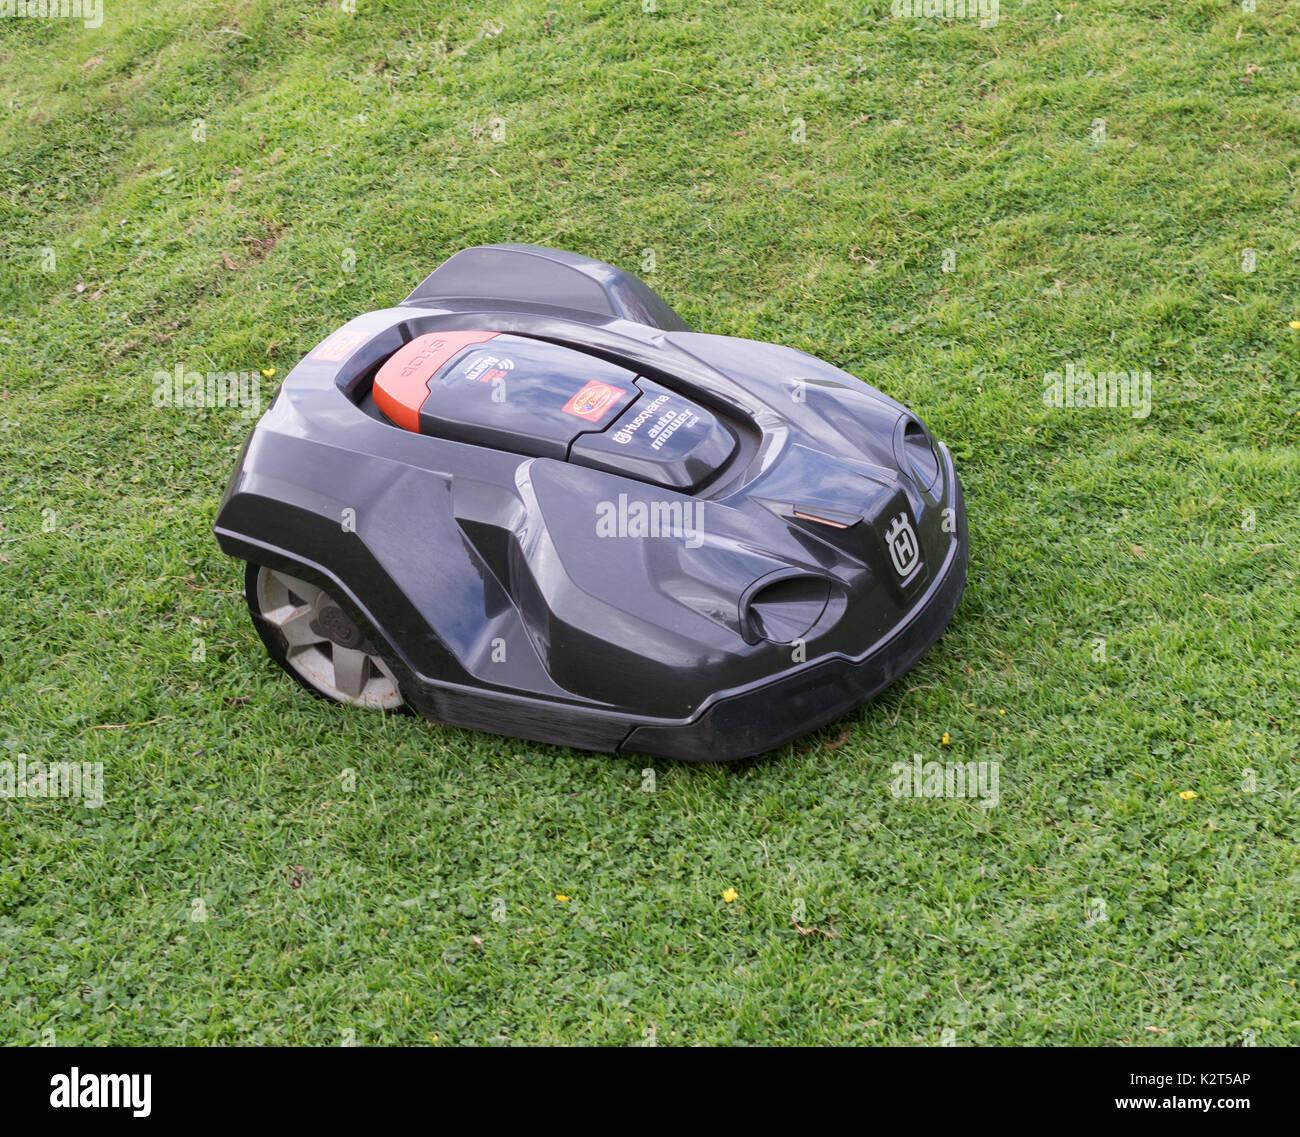 Husqvarna Automower, or robot mower, cutting grass Stock Photo